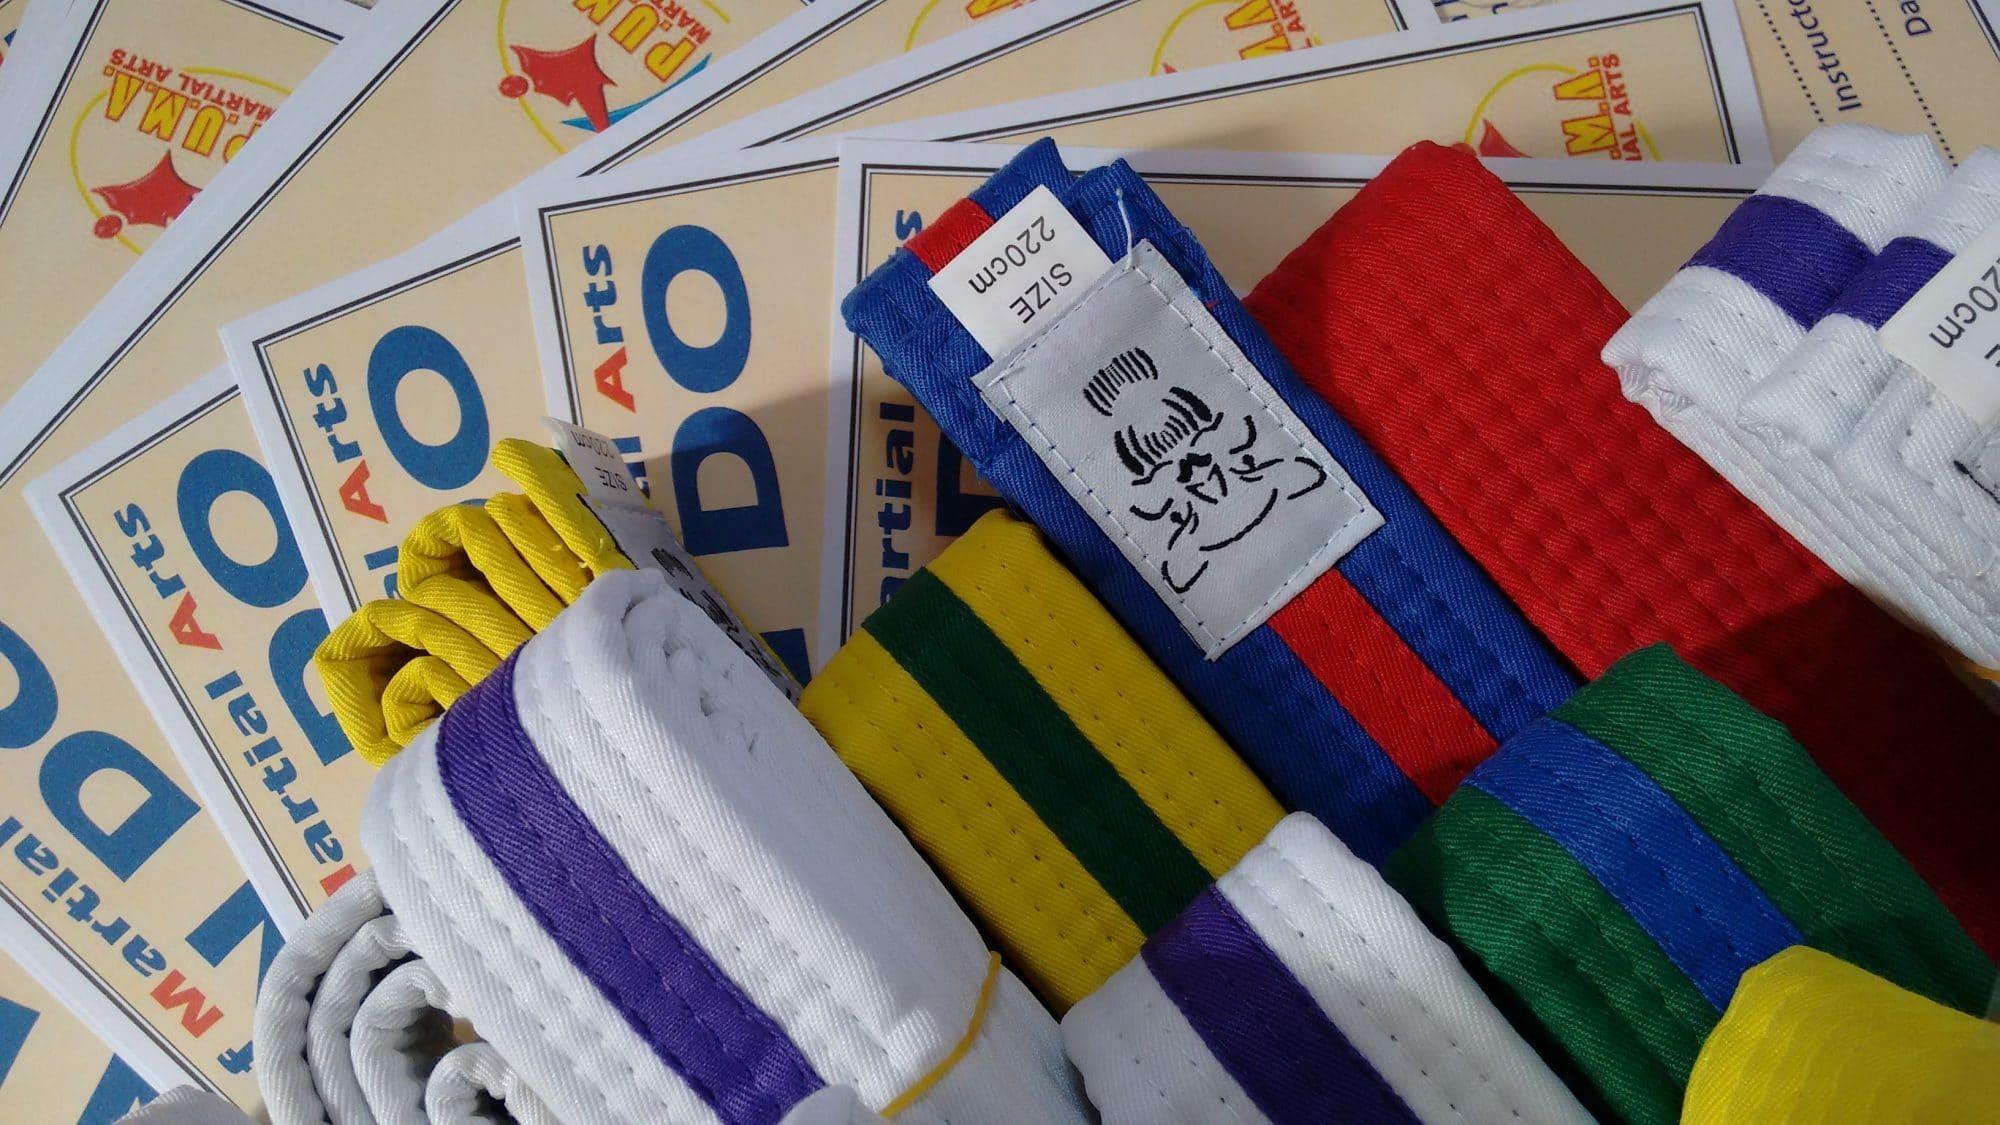 Taekwondo Grading and Belts